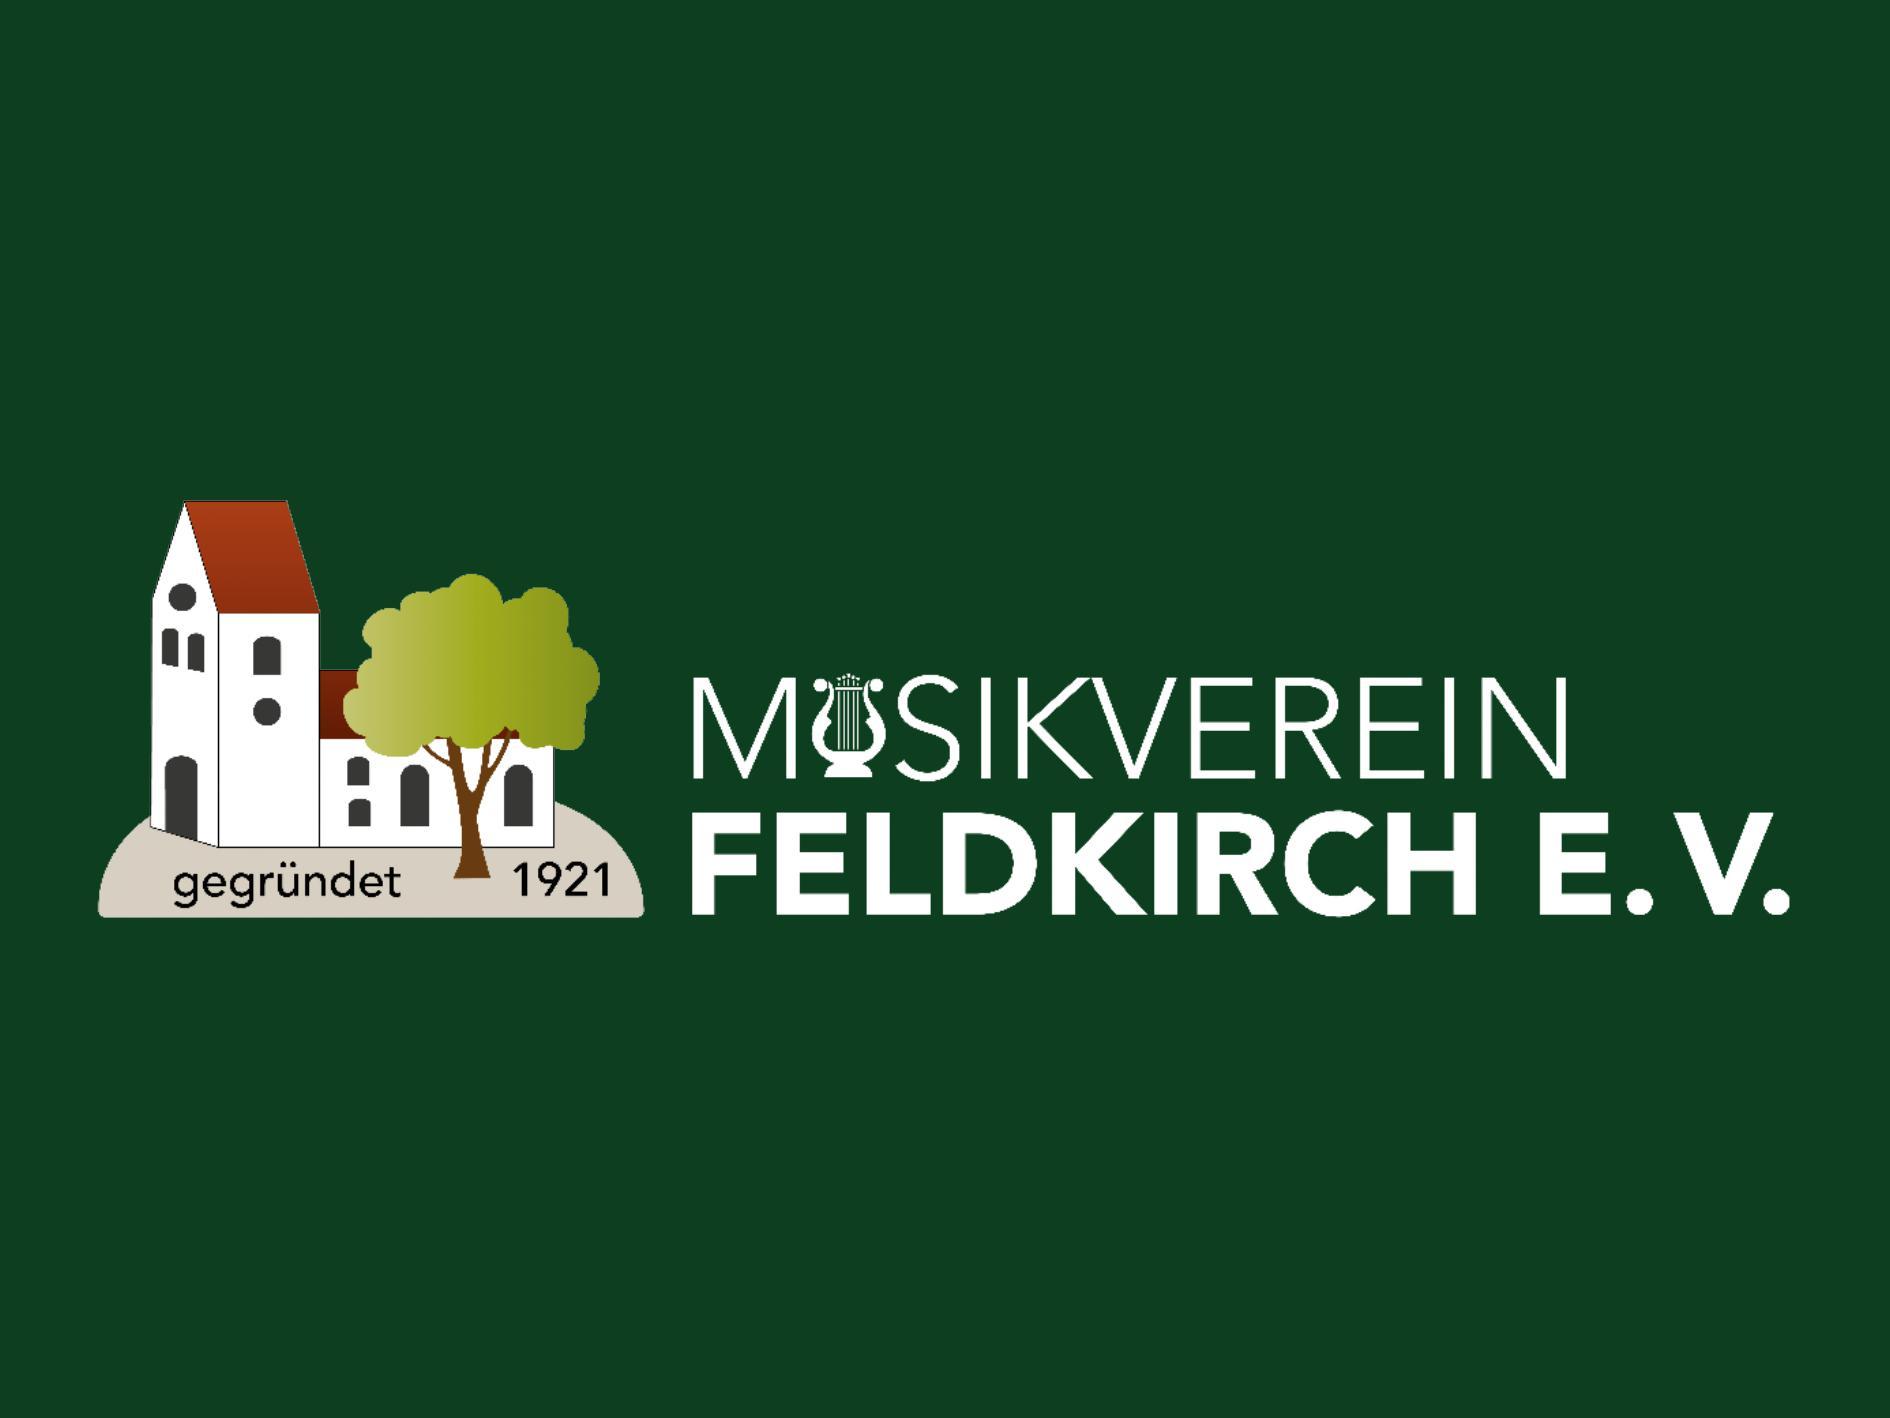 Musikverein Feldkirch